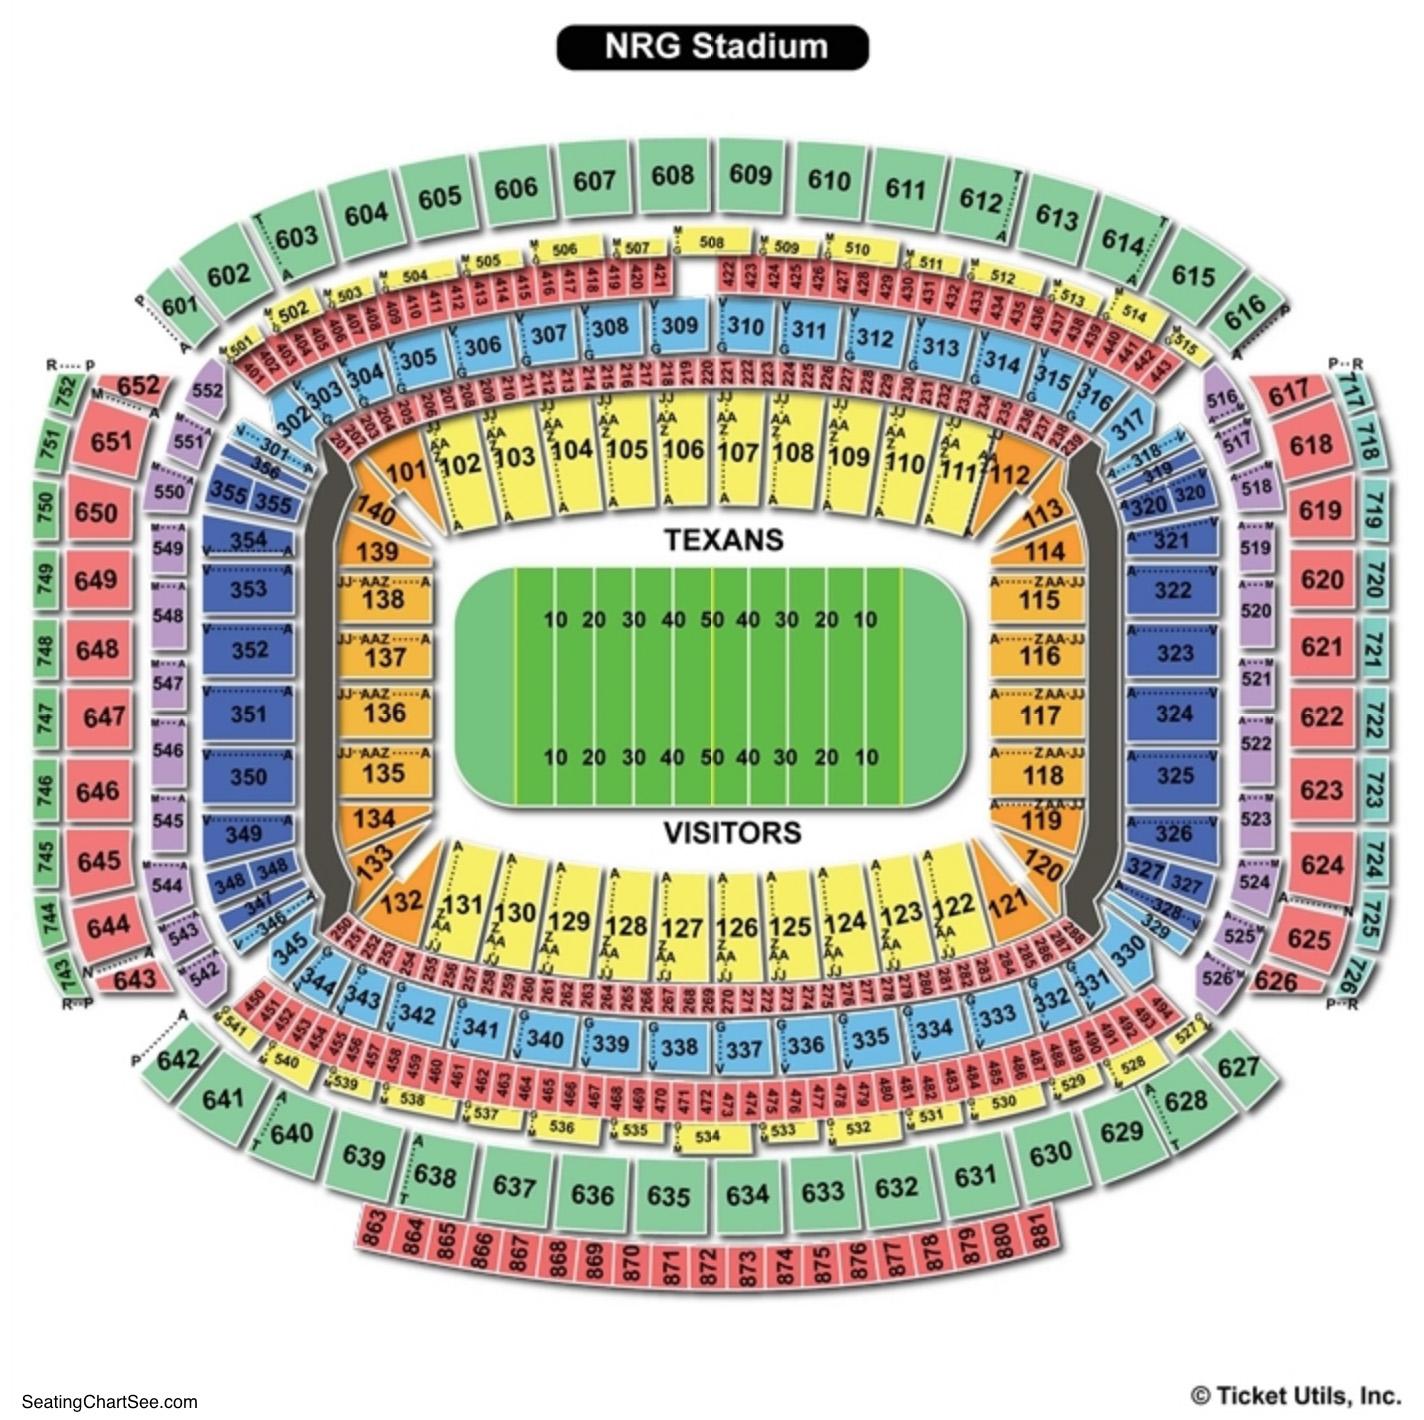 NRG Stadium Football Seating Chart